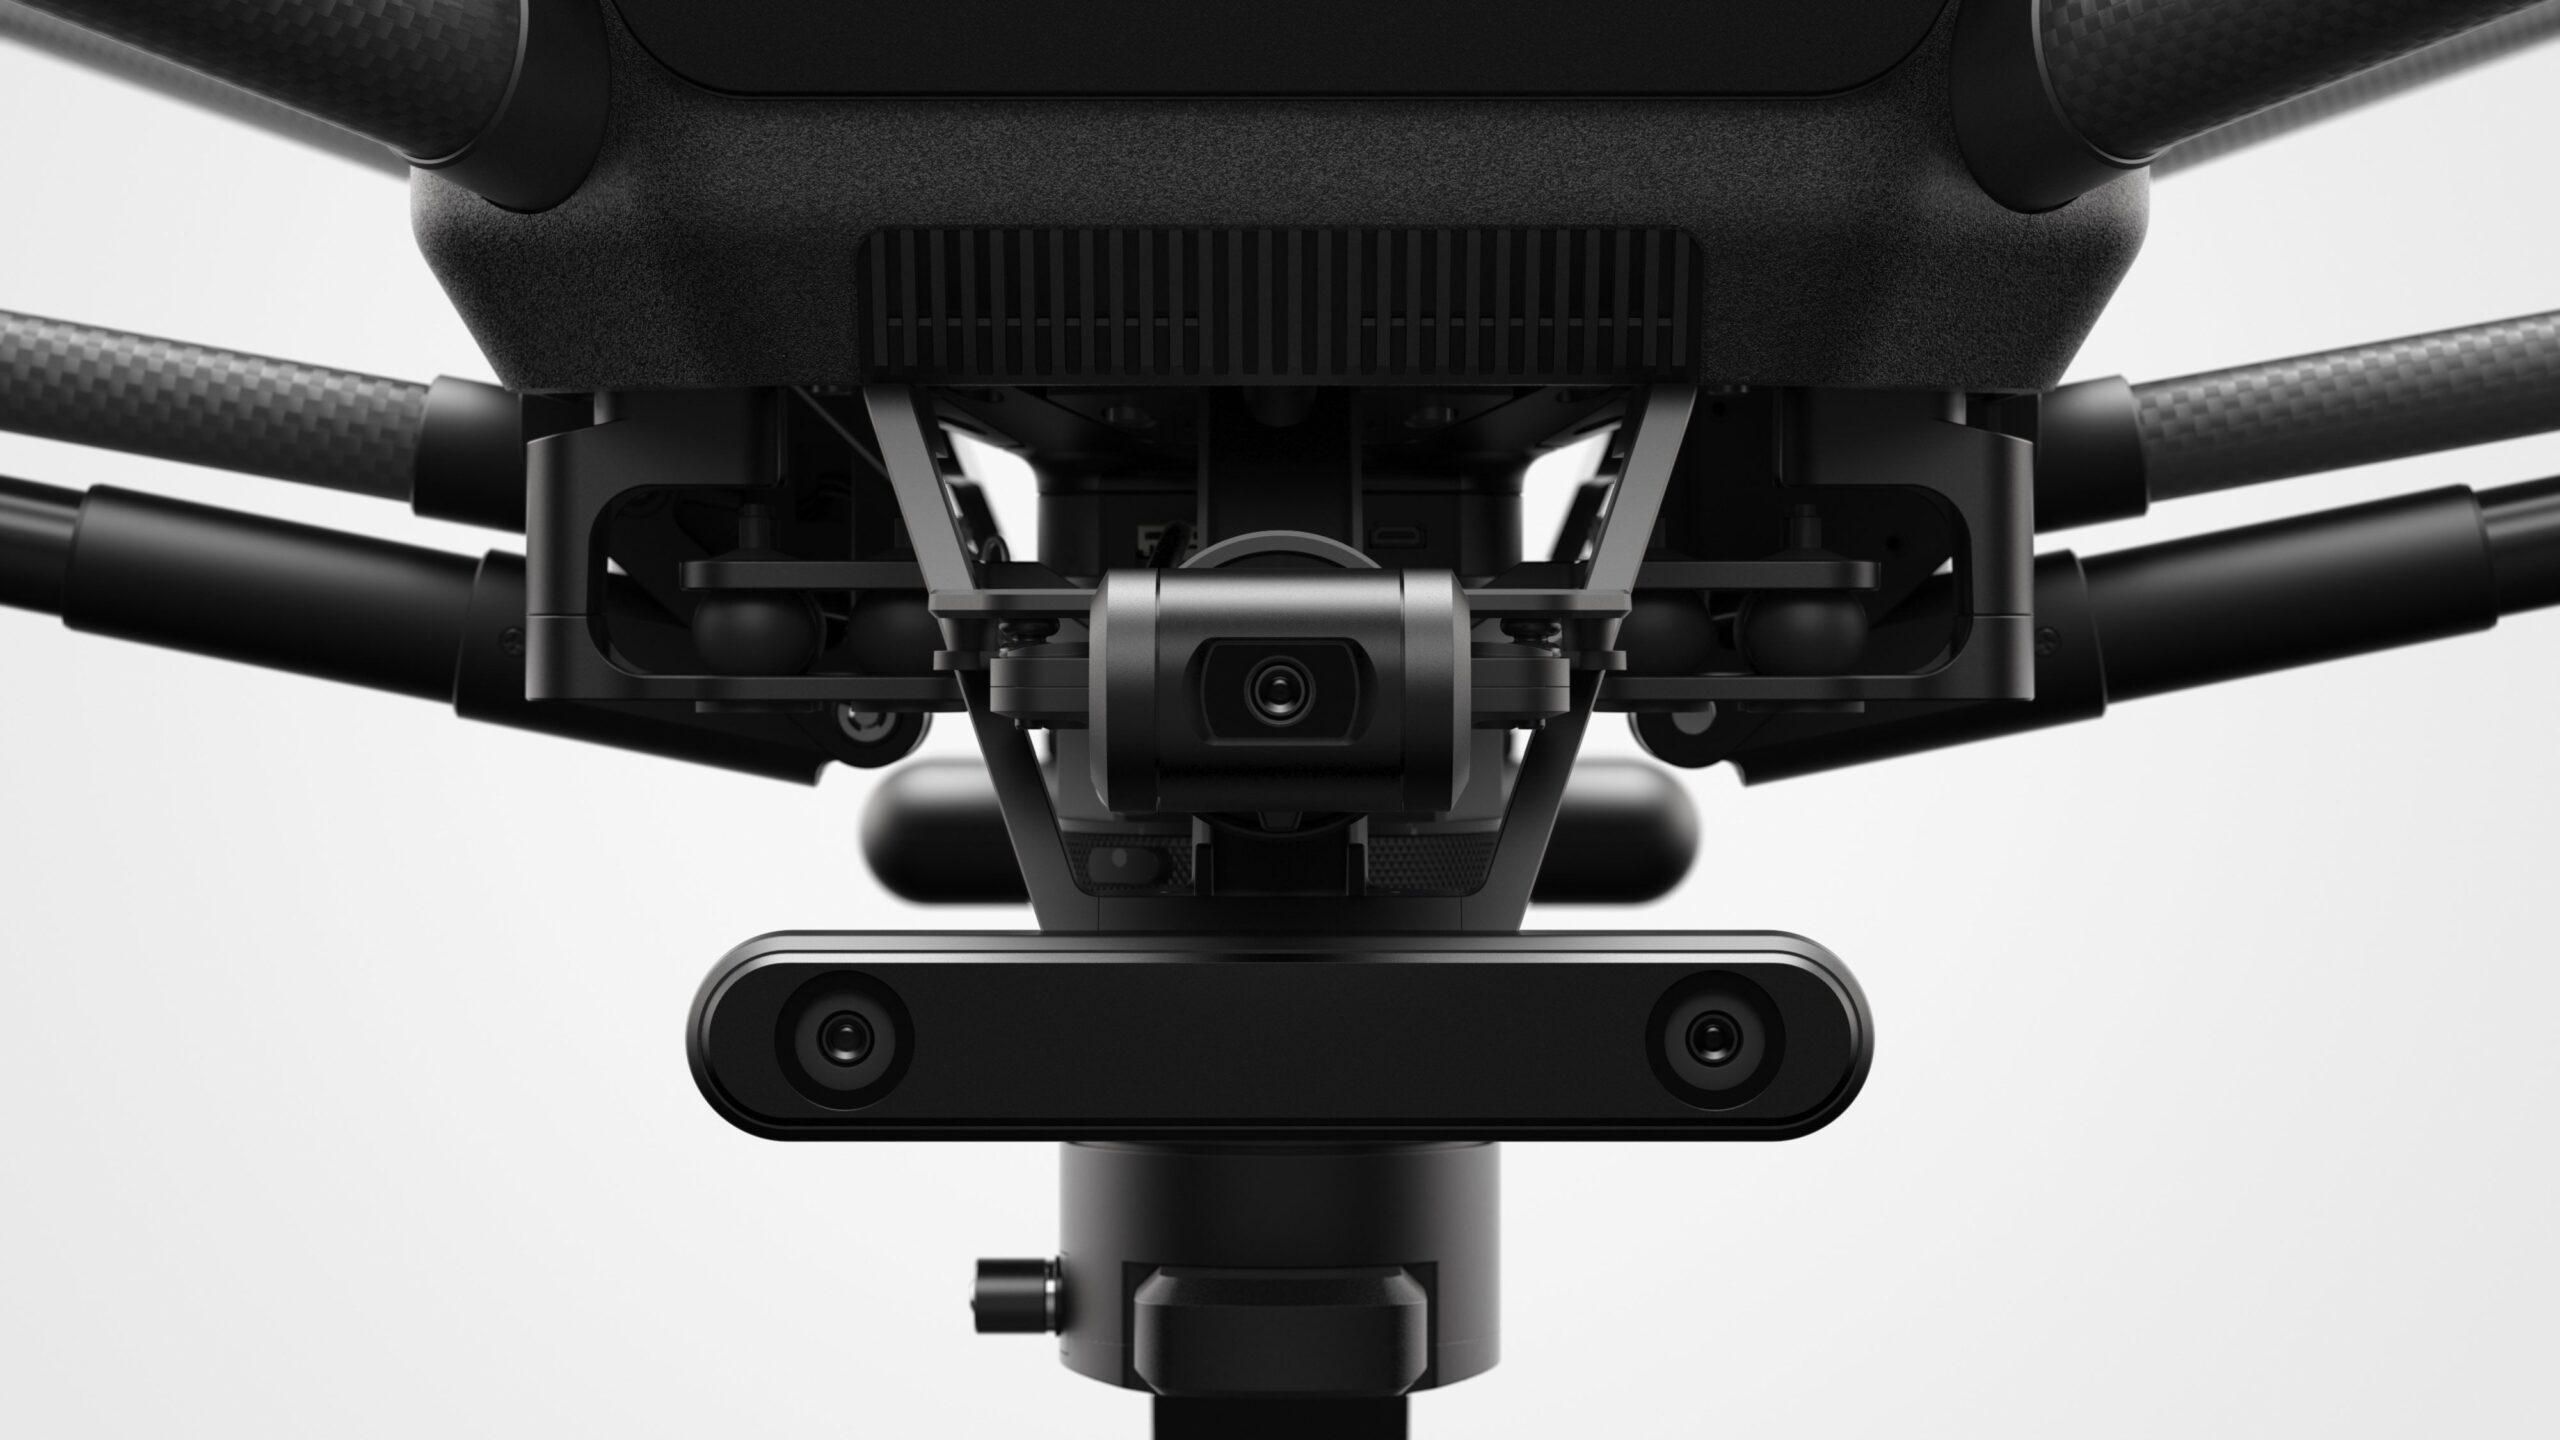 Built-in camera in Sony Airpeak drone